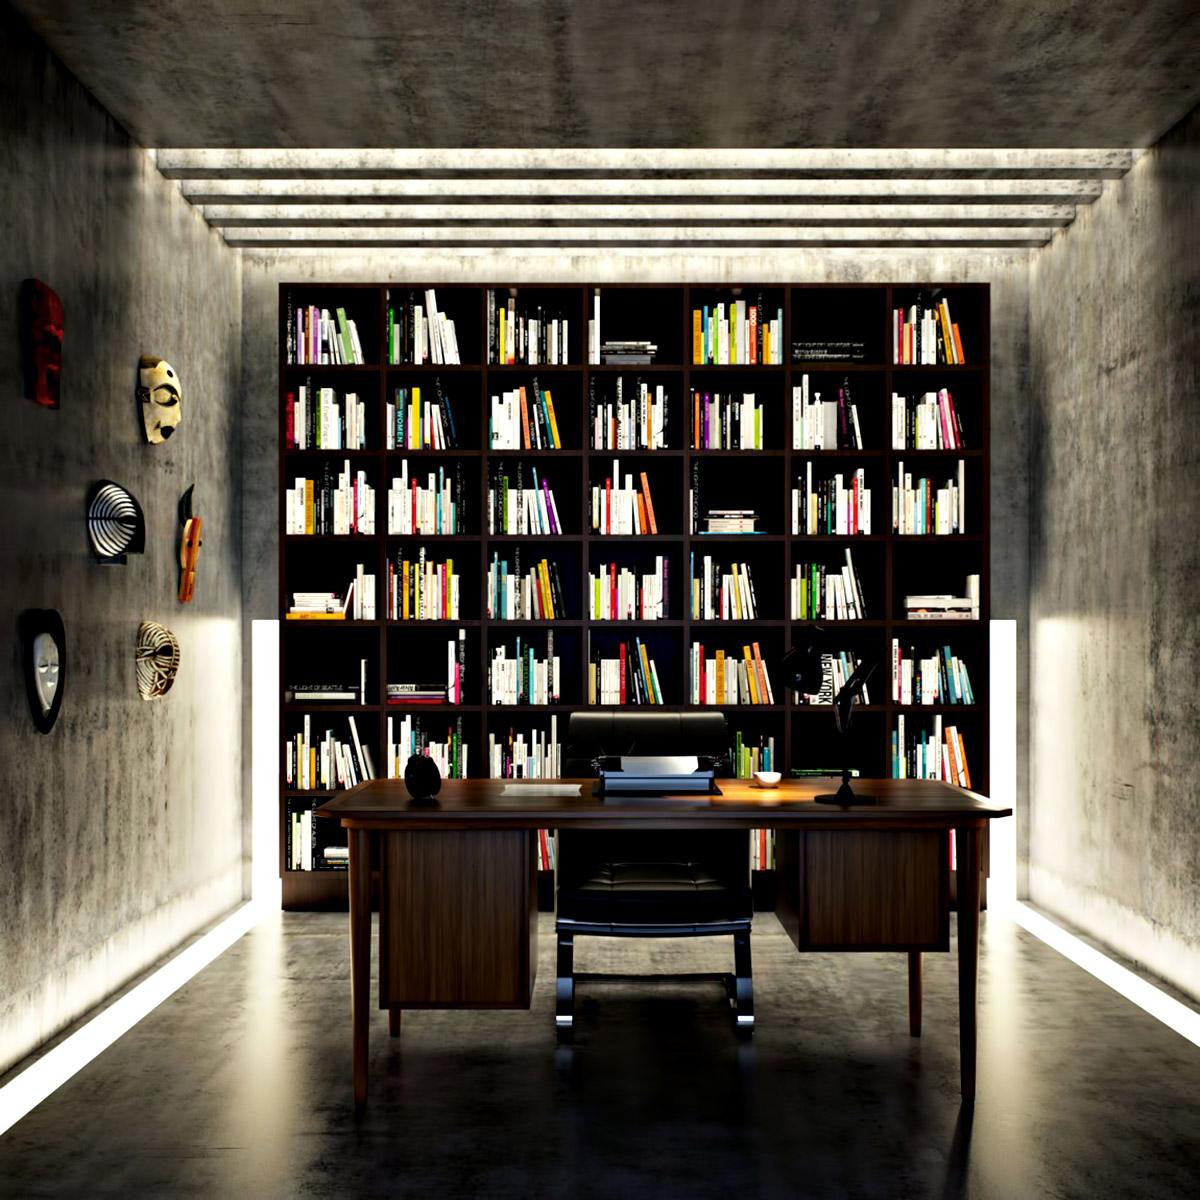 Writer's Room - Ex Machina Film Inspires Architecture for a Writer's Modern Concrete Home Design